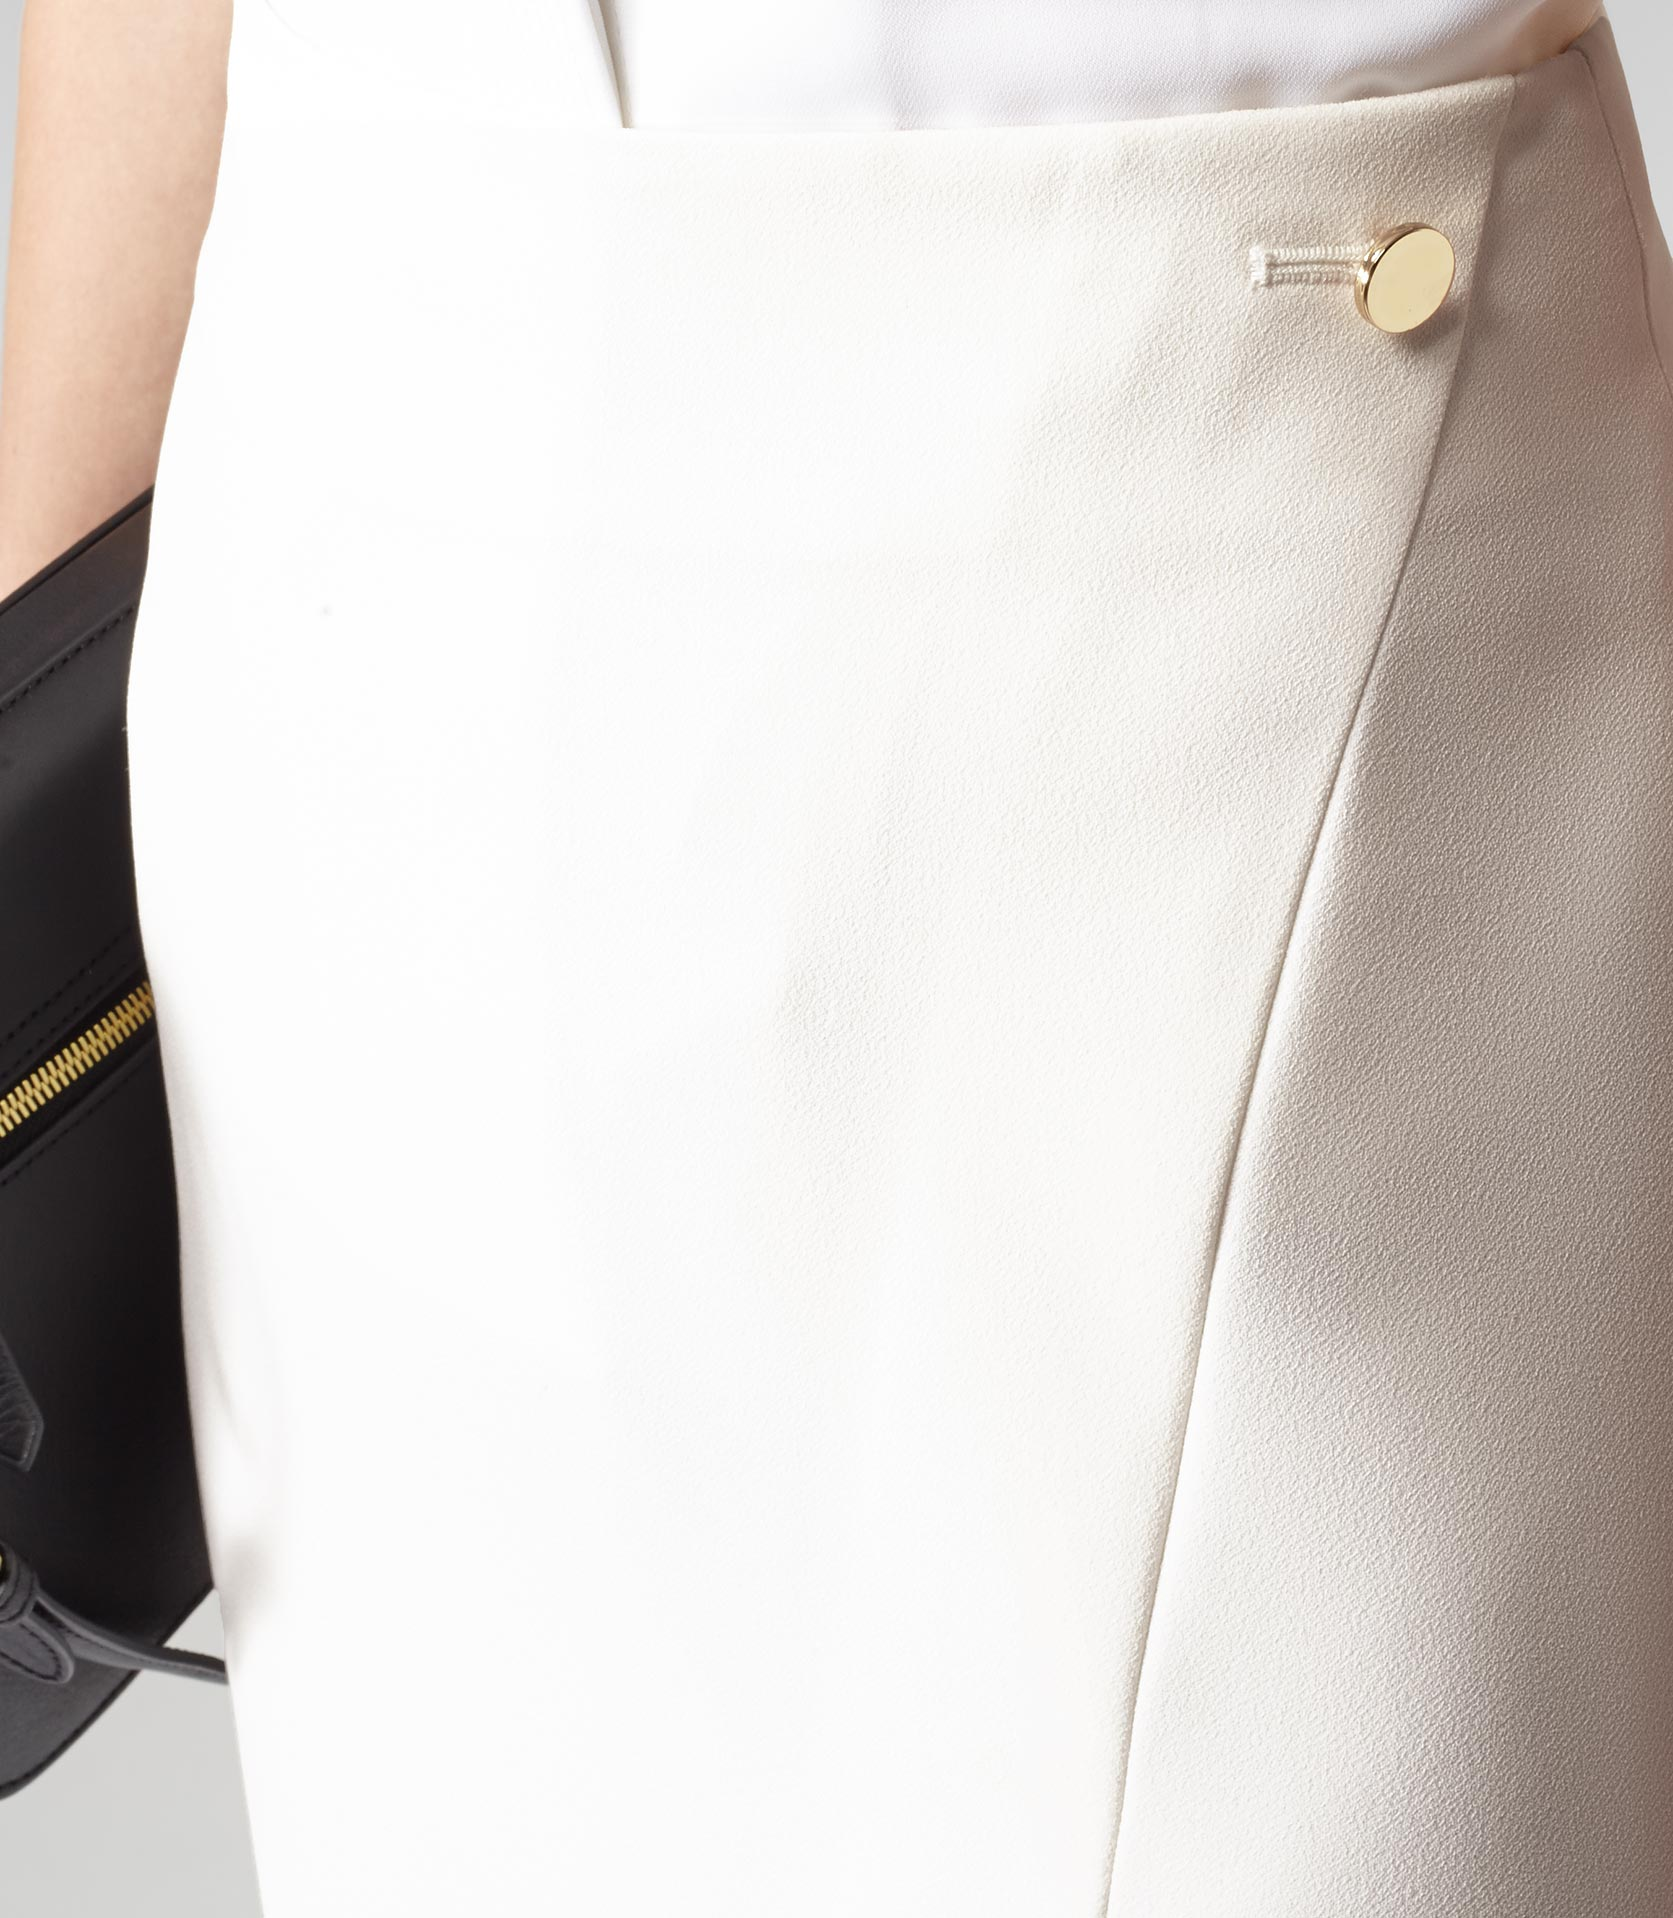 Adriana Ivory Button Wrap Style Skirt - REISS